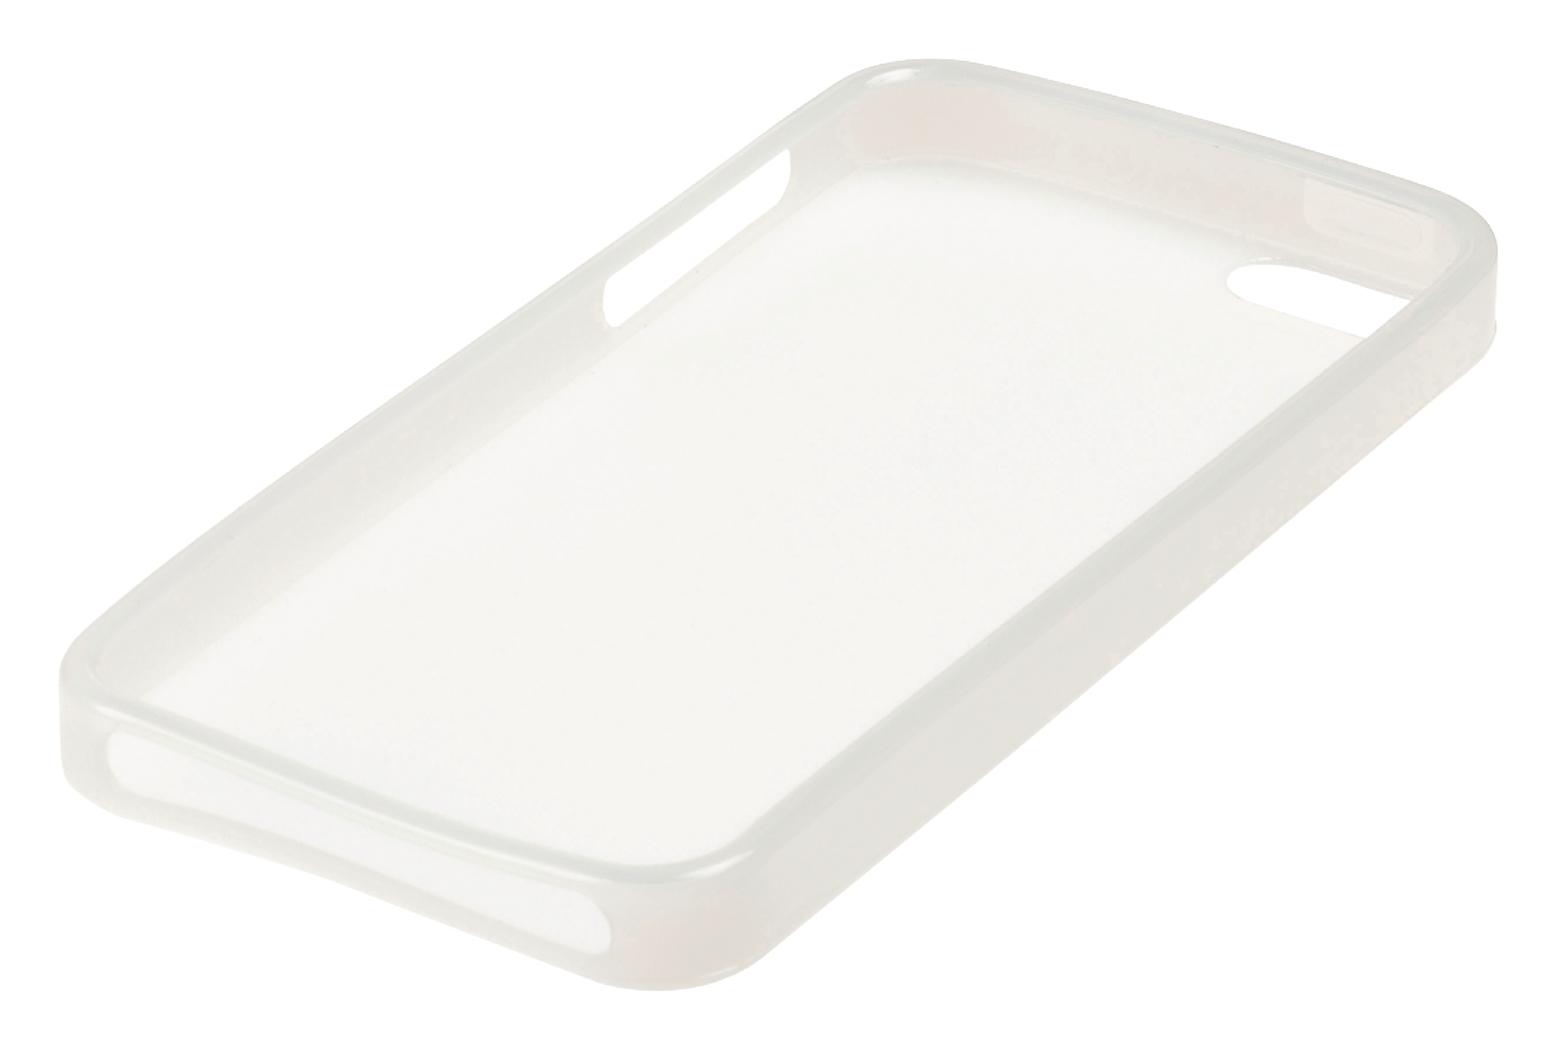 Gelhoes iPhone 6 Plus wit